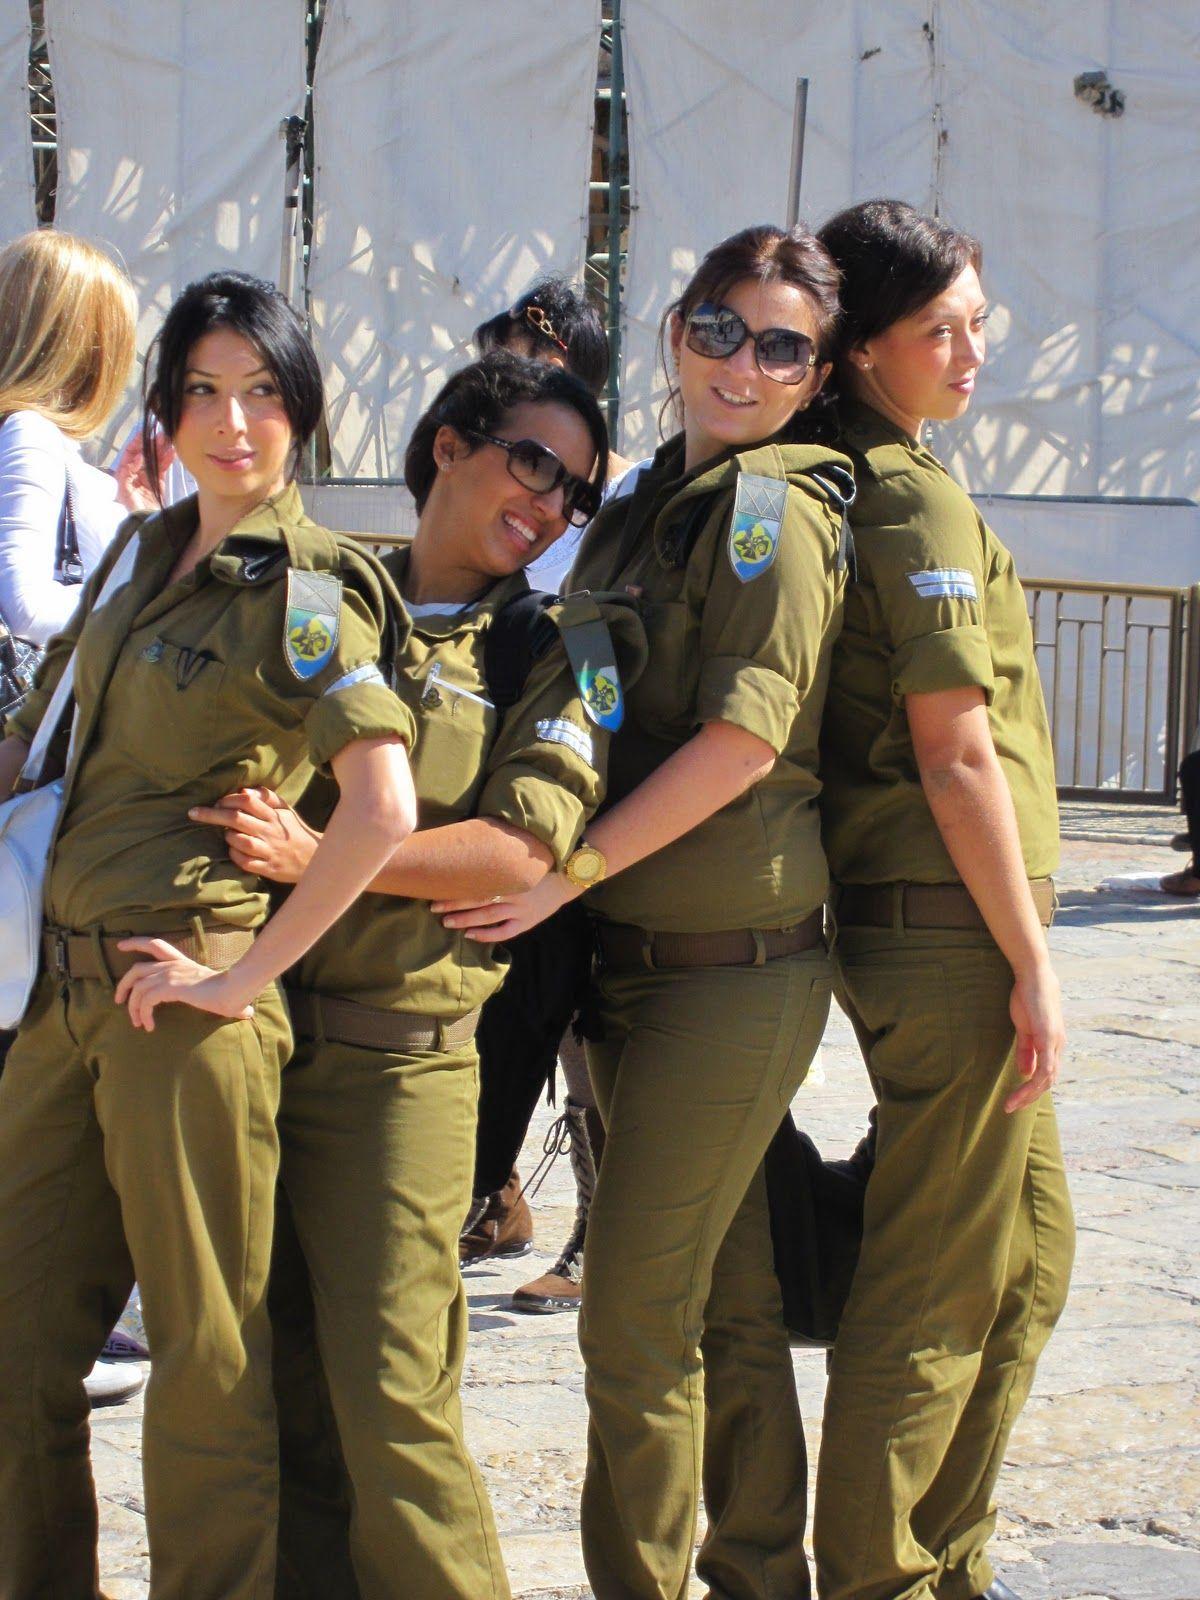 jerusalem girls